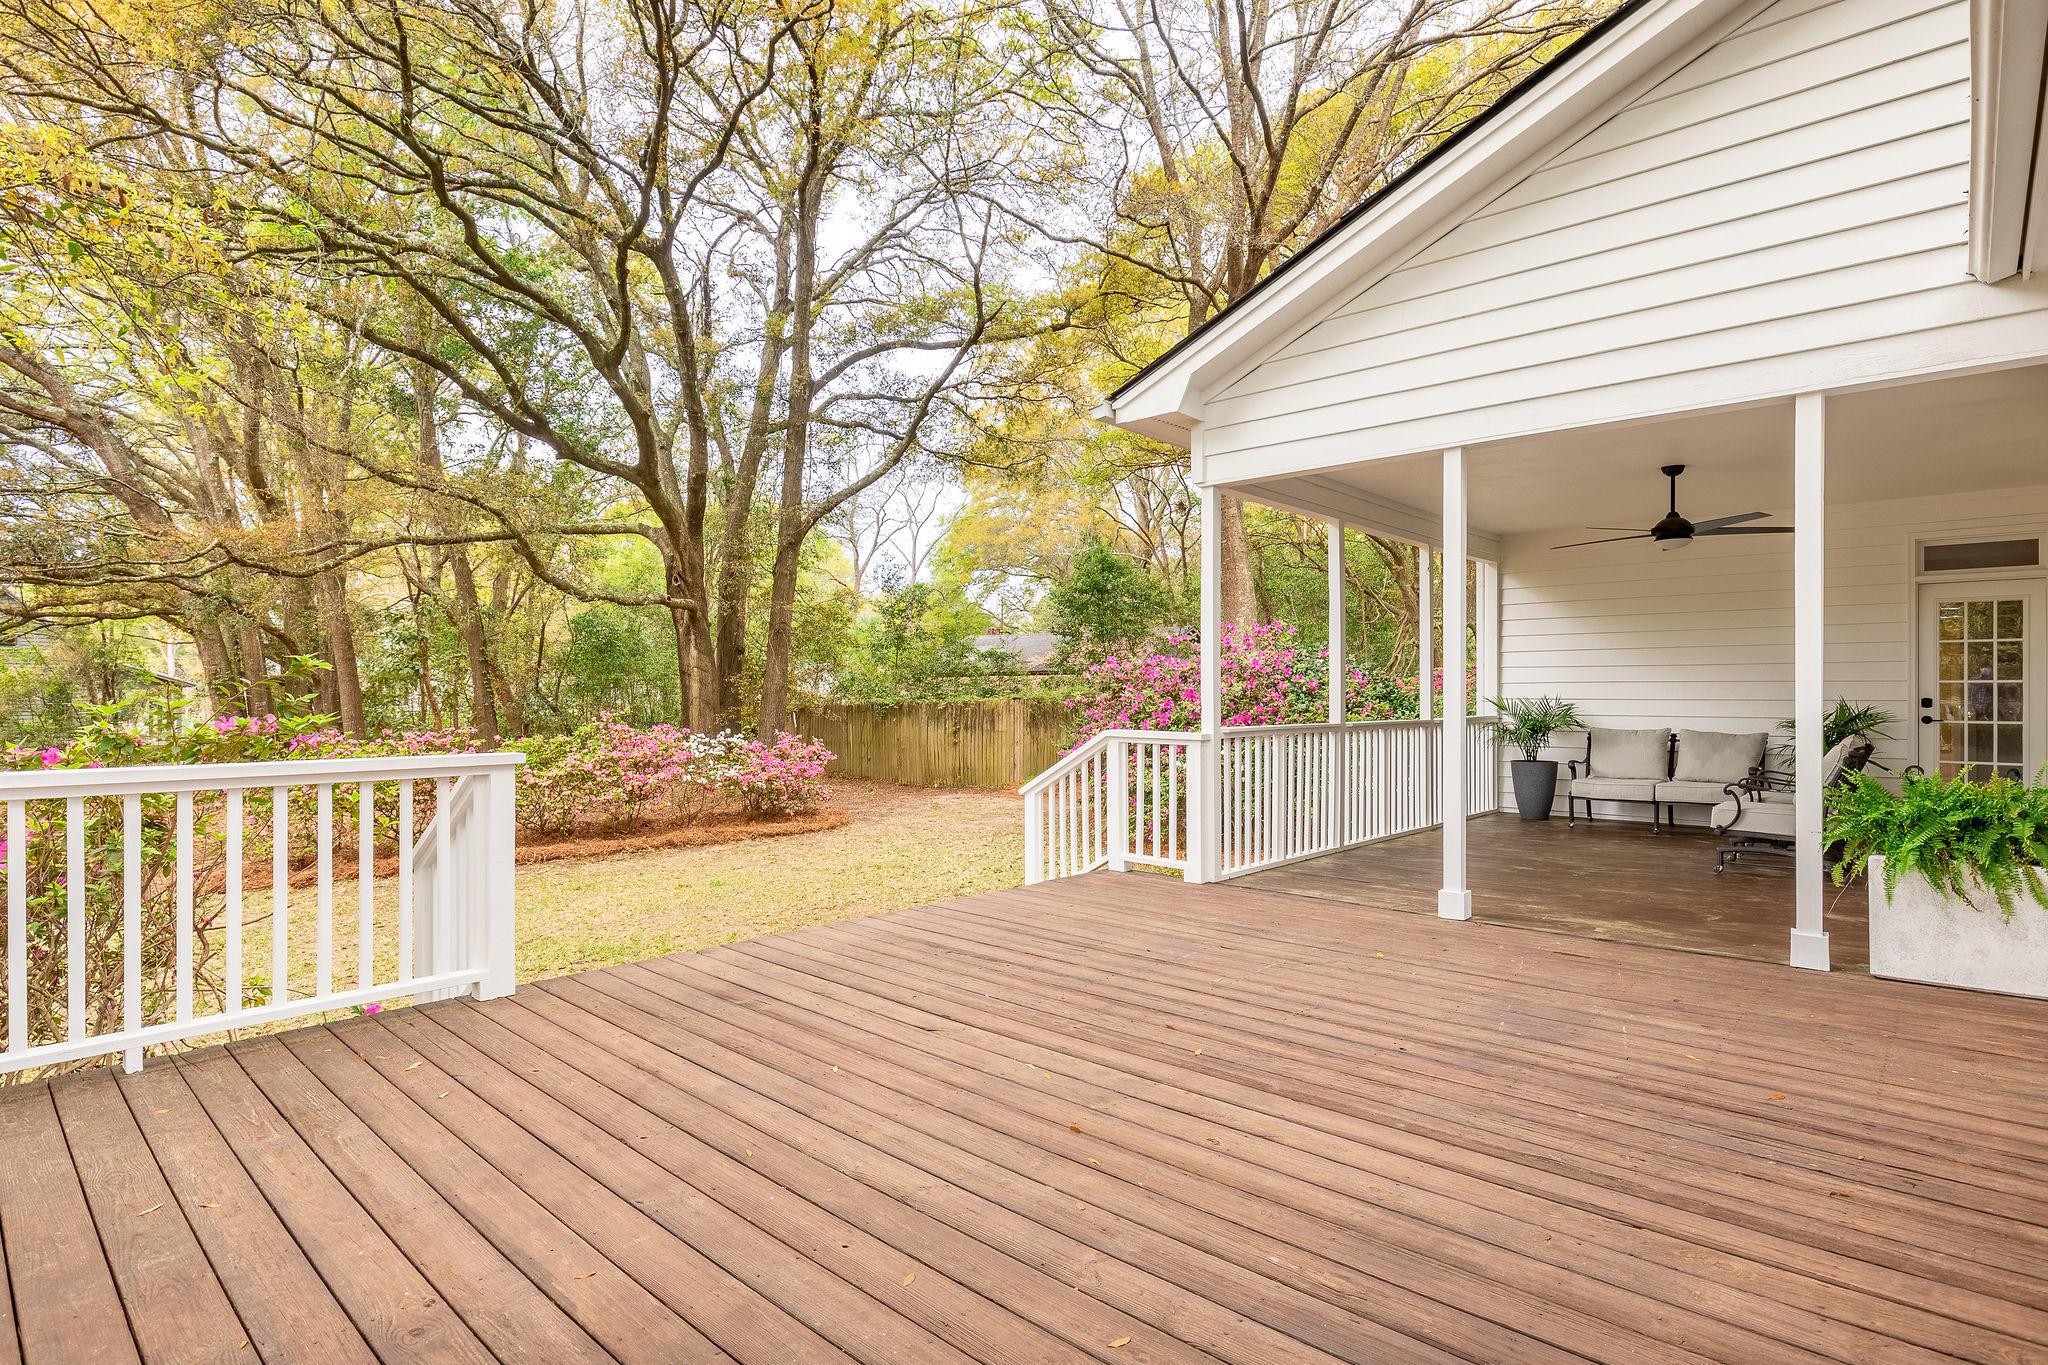 Old Mt Pleasant Homes For Sale - 1417 Edwards, Mount Pleasant, SC - 30